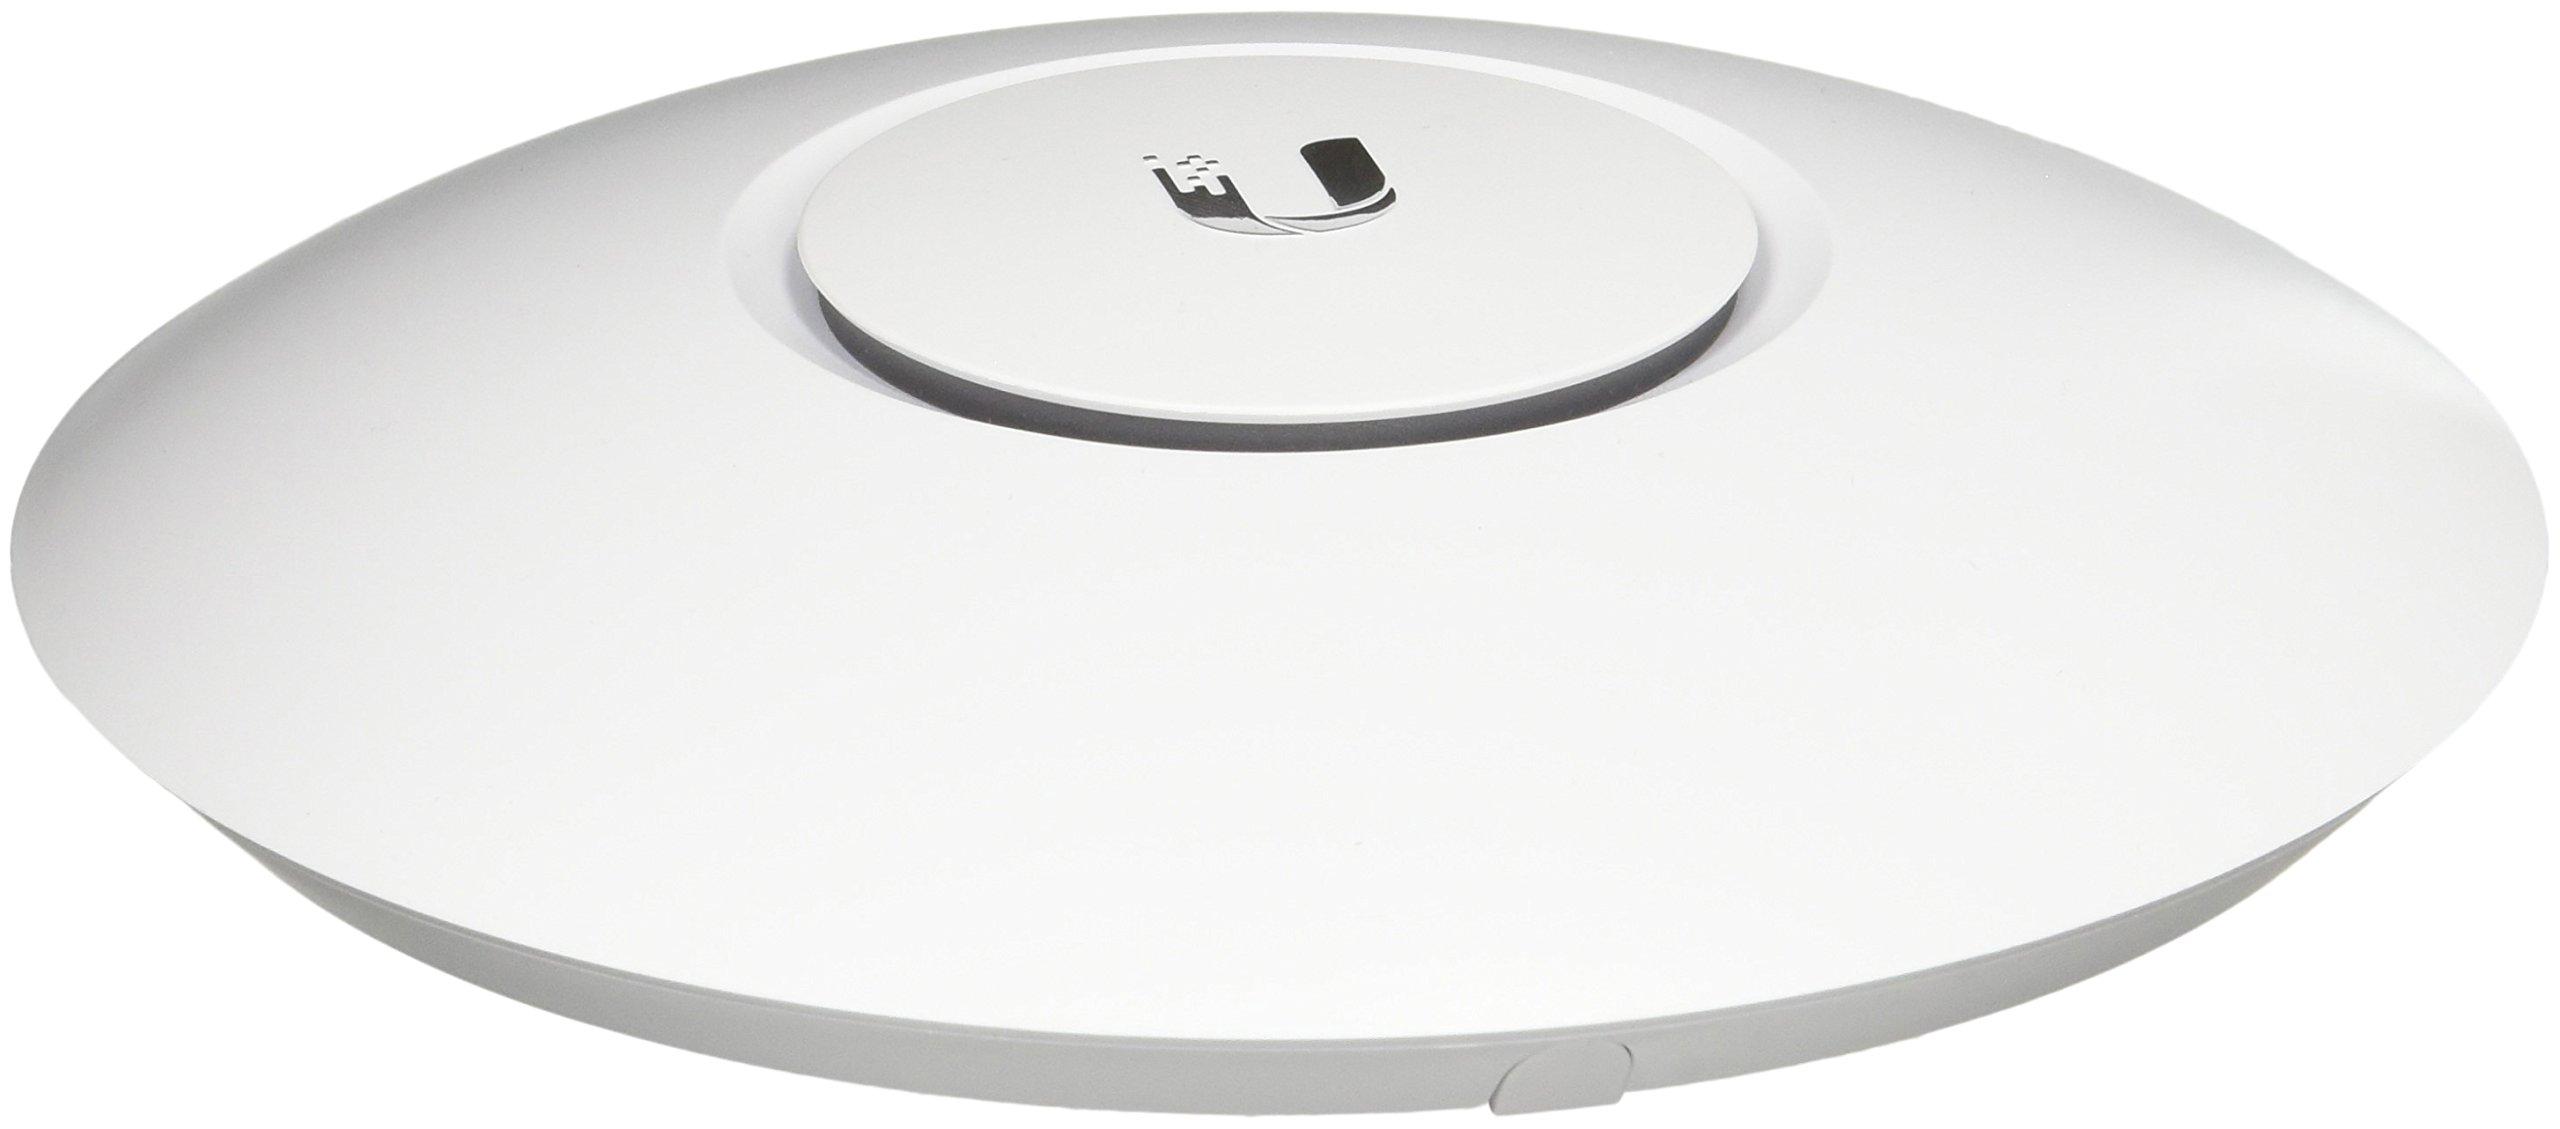 Ubiquiti Unifi Ap-AC Lite - Wireless Access Point - 802.11 B/A/G/n/AC (UAPACLITEUS)